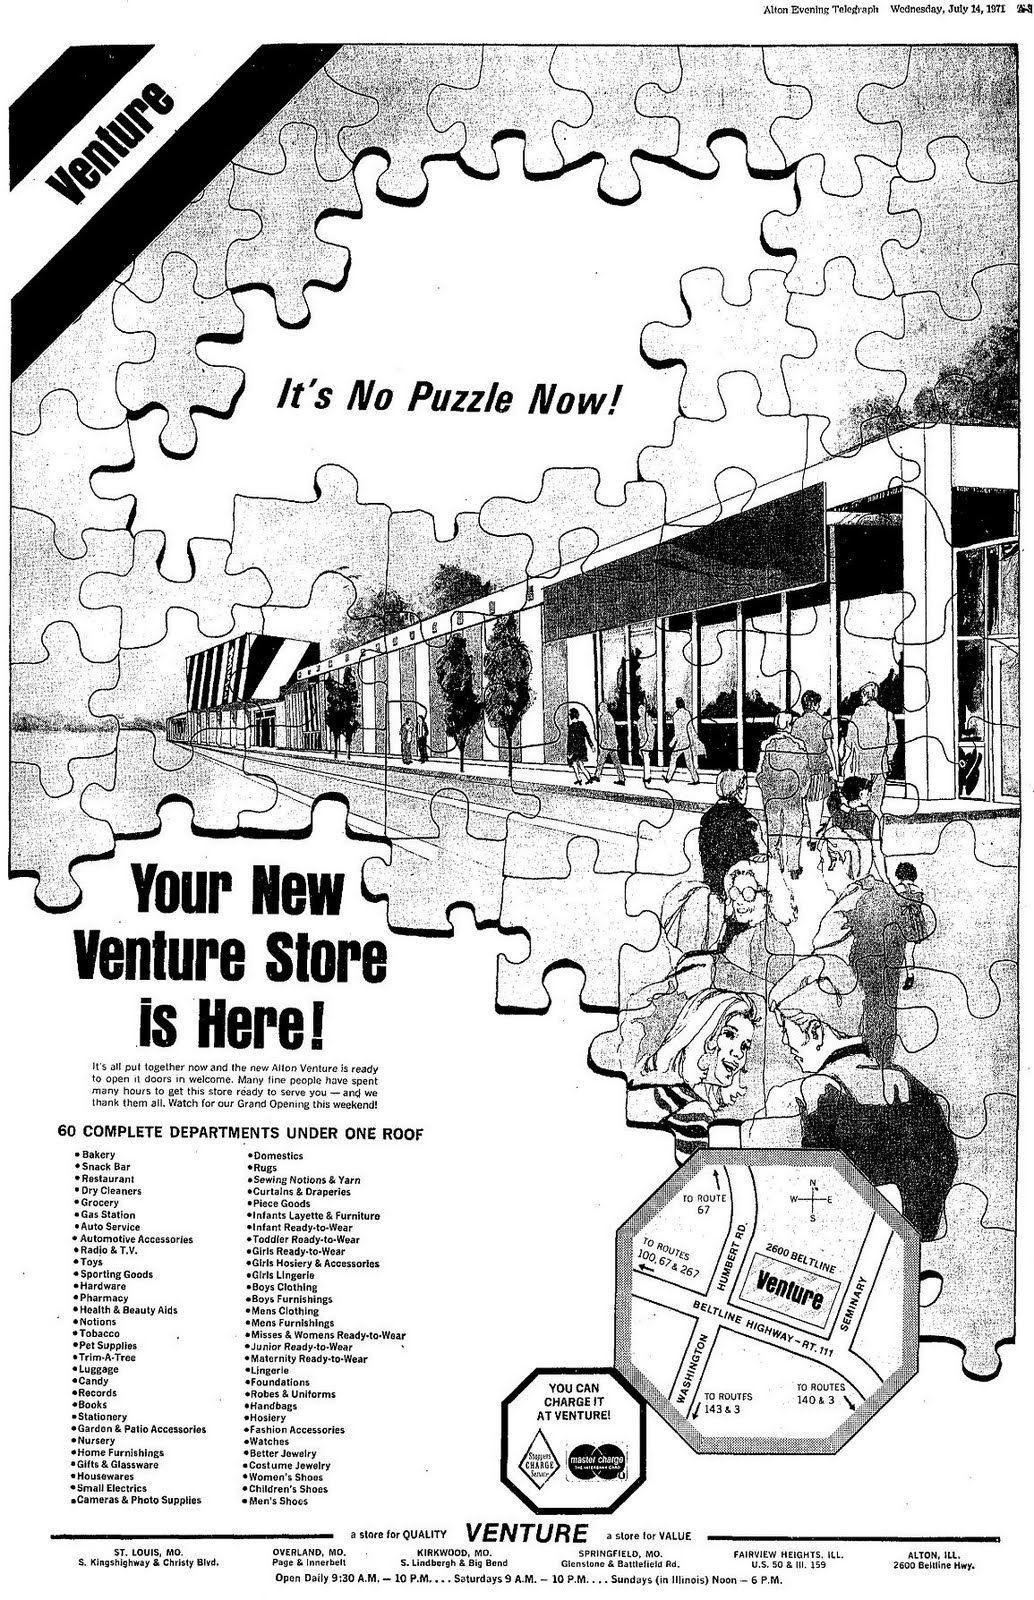 Venture Store Ad Alton Illinois 1980 Alton Venture Vintage Advertisements